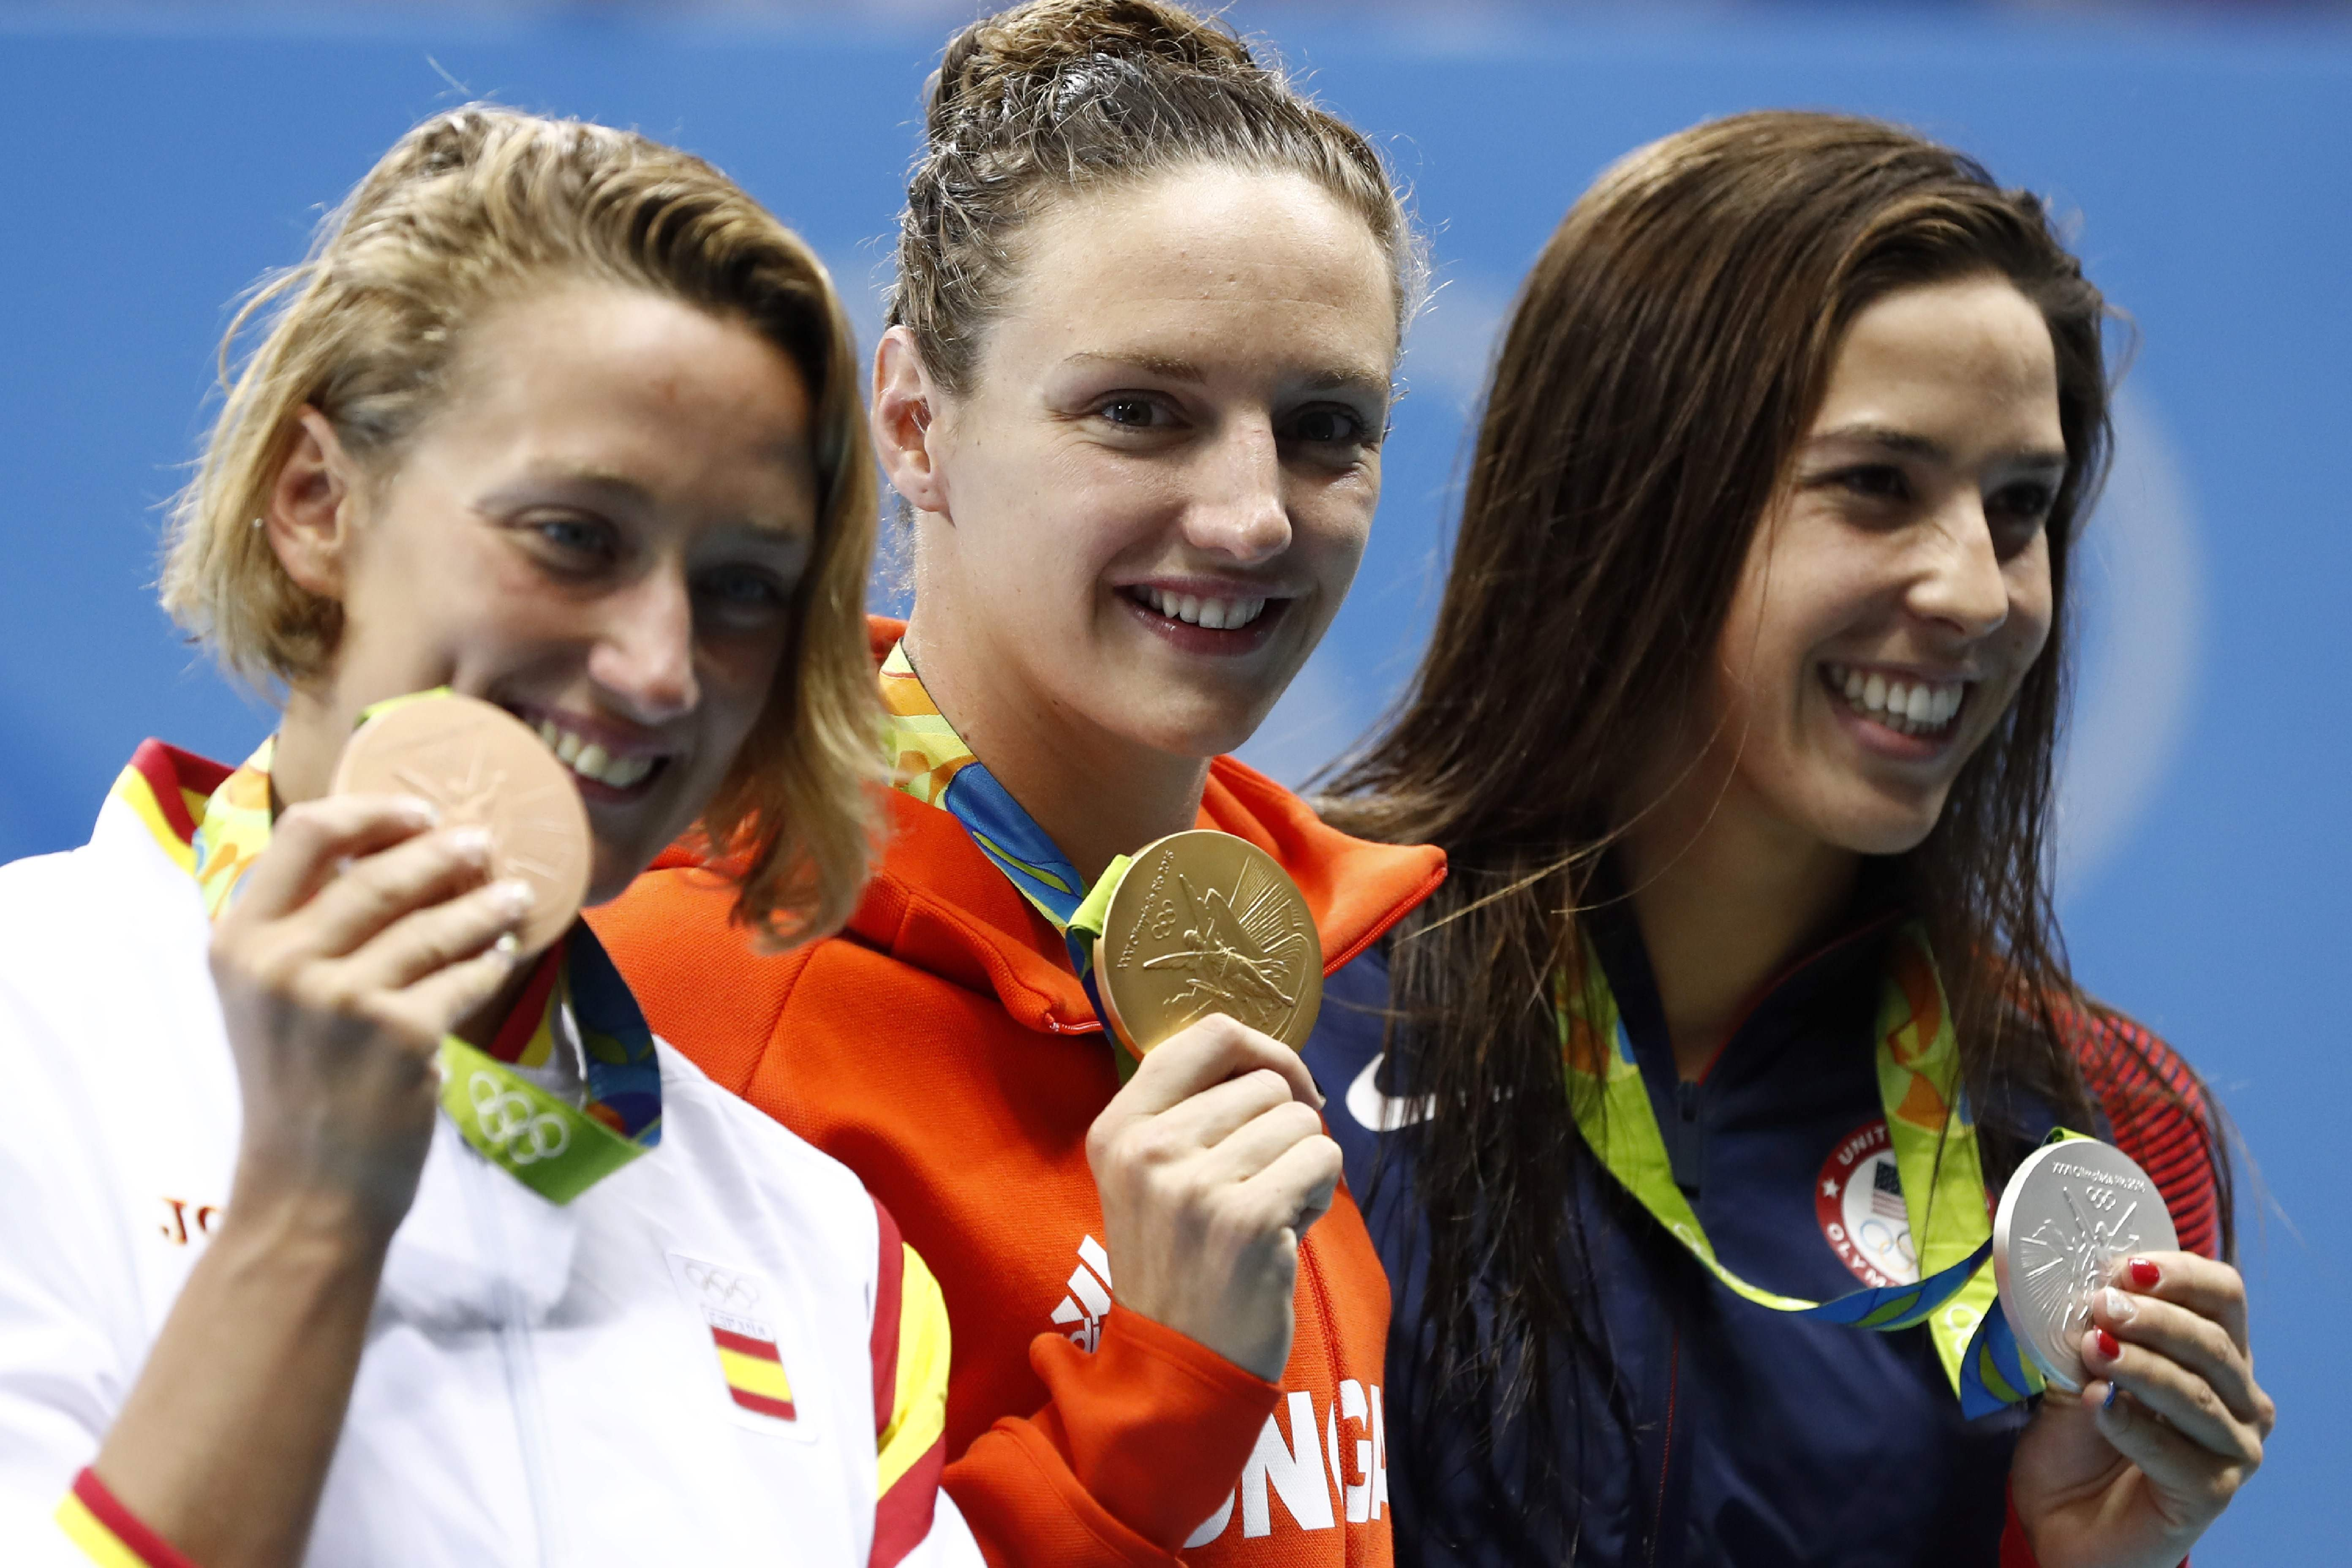 Swimming: Hungary's Iron Lady finally strikes gold